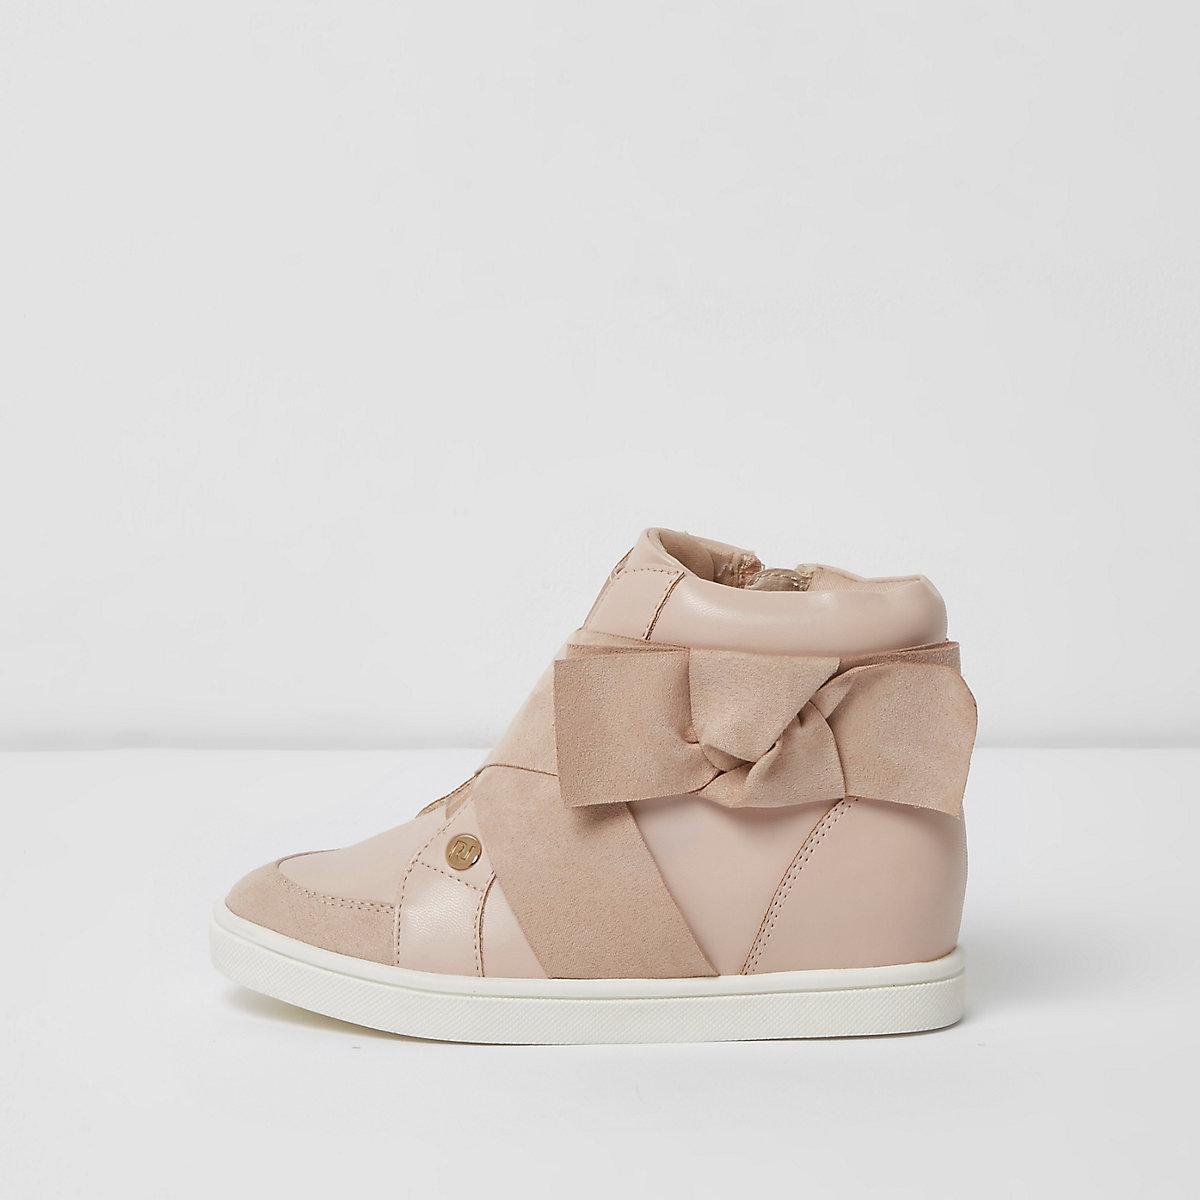 Pinke, hohe Sneakers mit Schleife